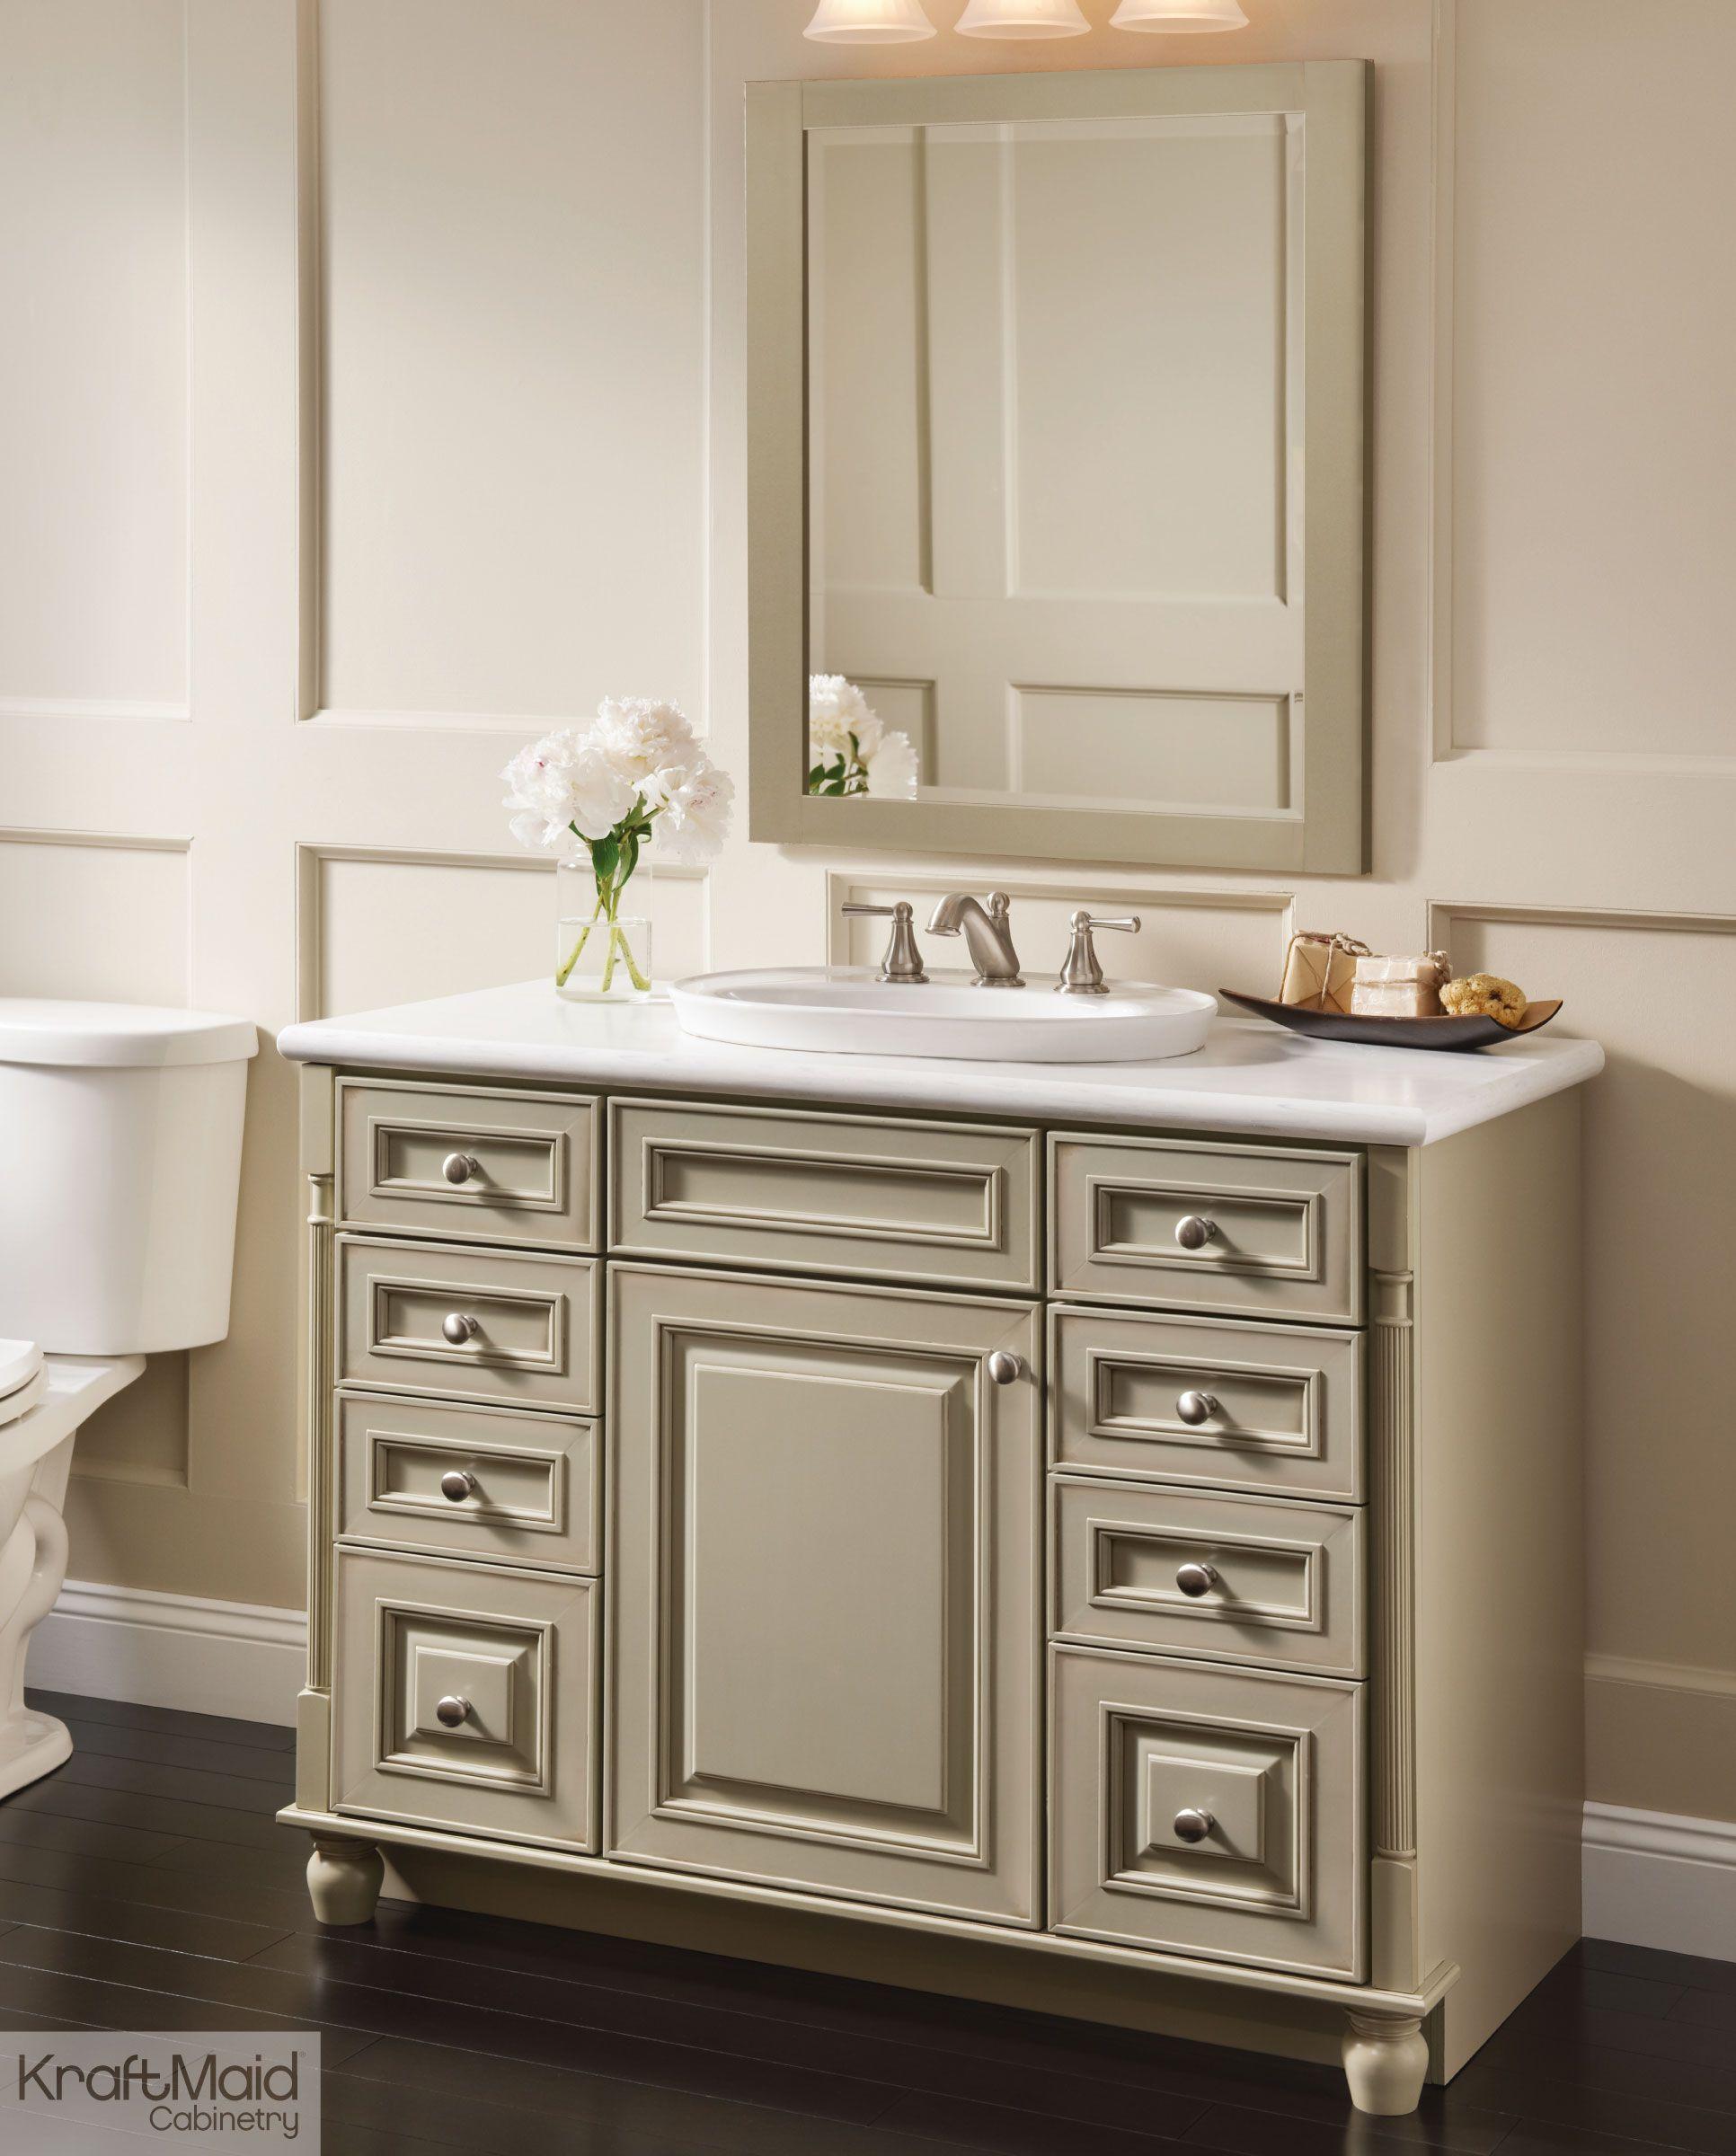 Kraftmaid Bathroom Vanity Bedroom Furniture Bathroom Bathroom for measurements 1932 X 2400